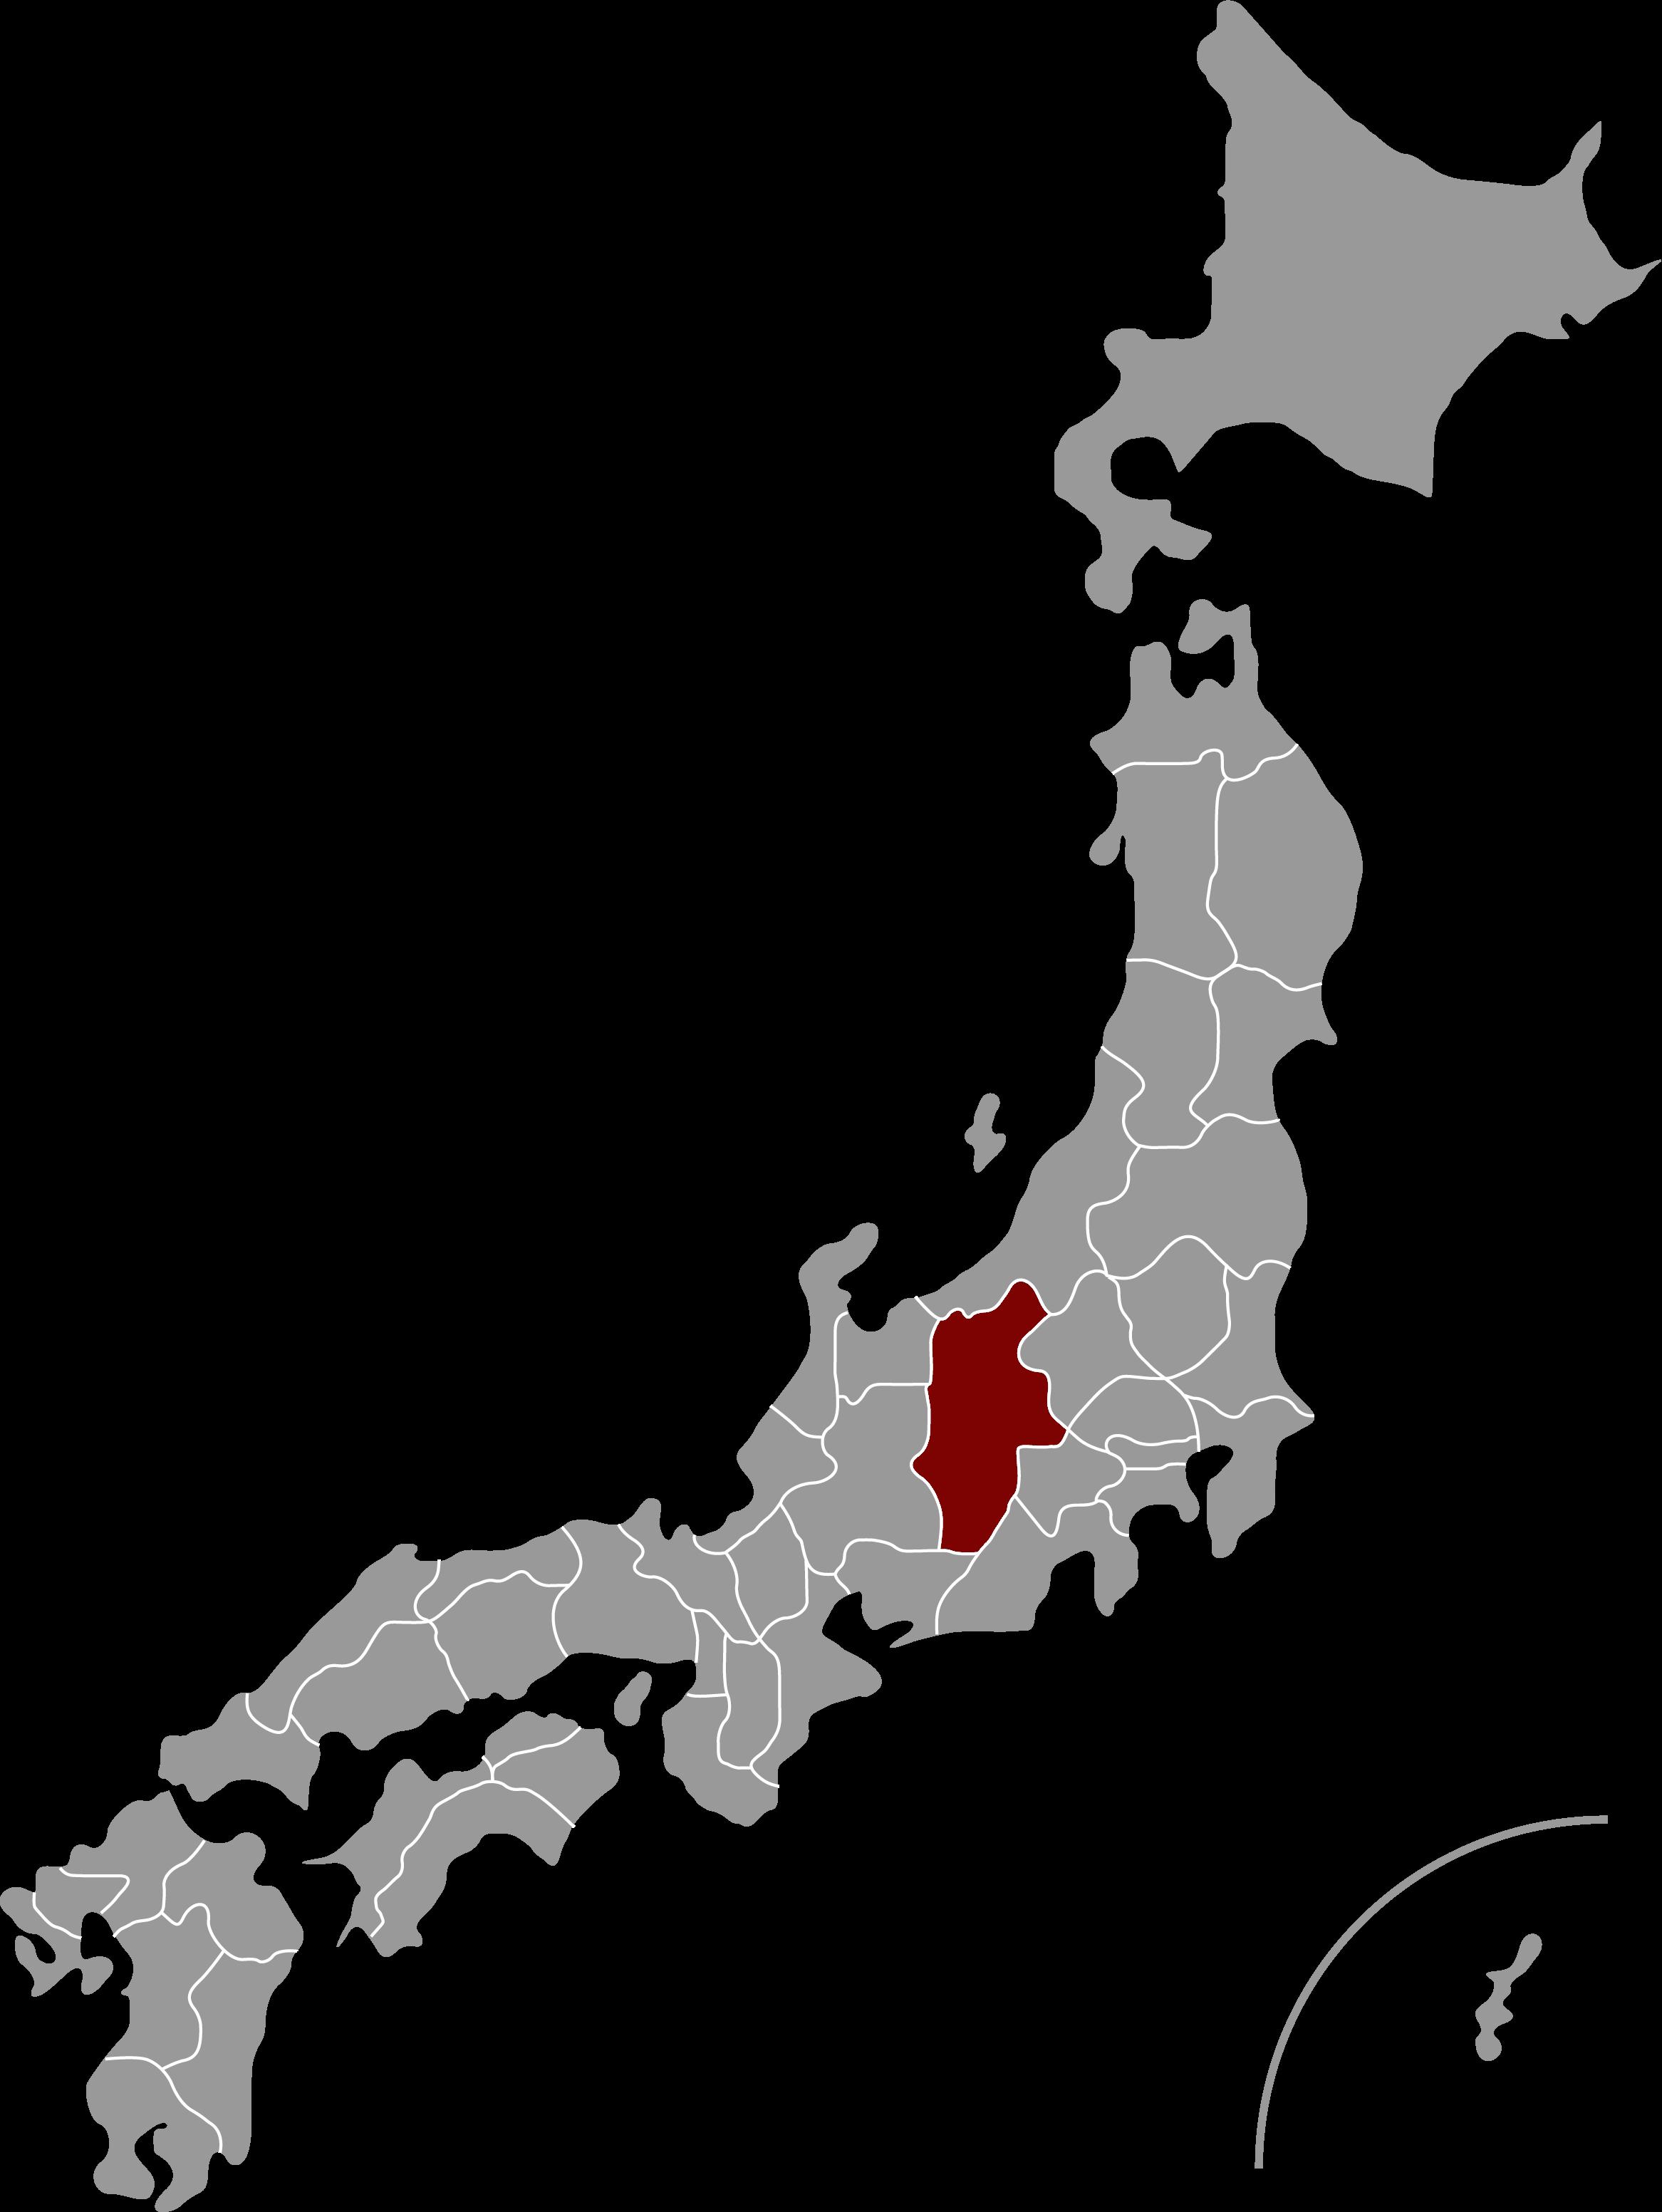 Nagano Perfecture